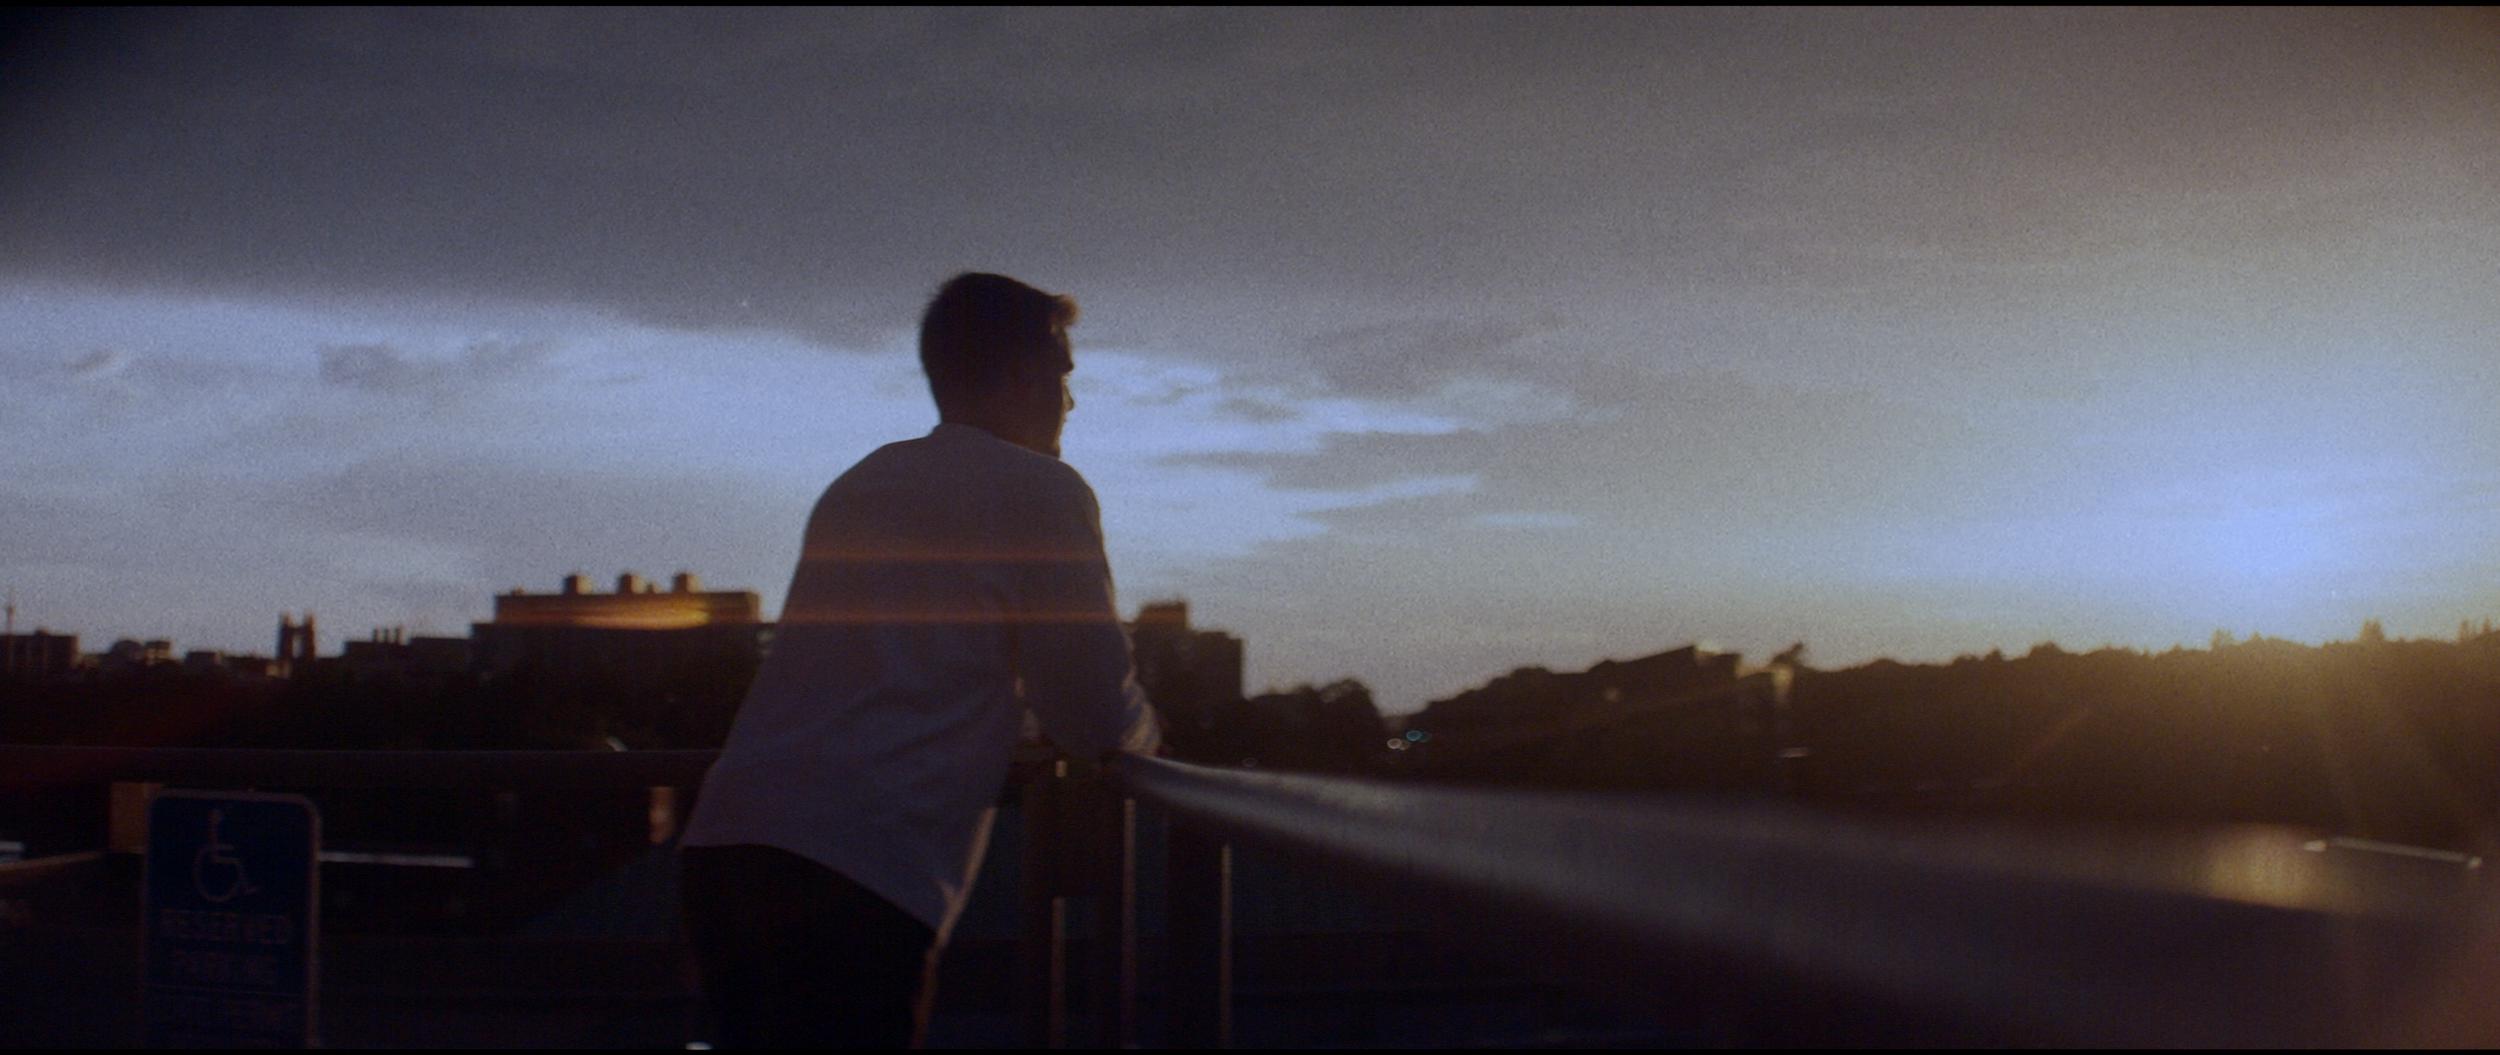 WAY UP_FILM_1.6.1.png